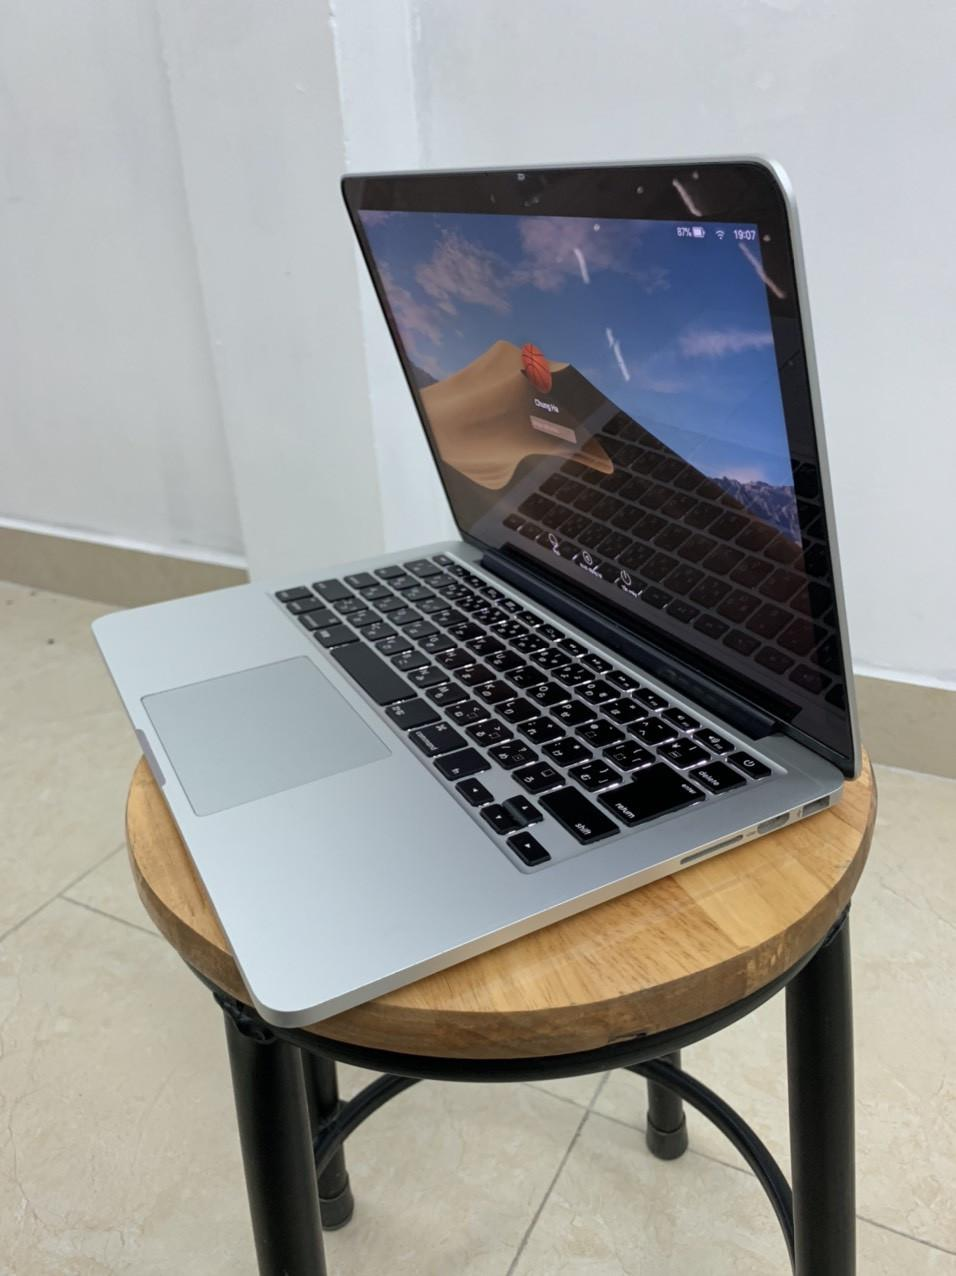 "Macbook Pro 2013 13"", Core i5/4GB/128GB"